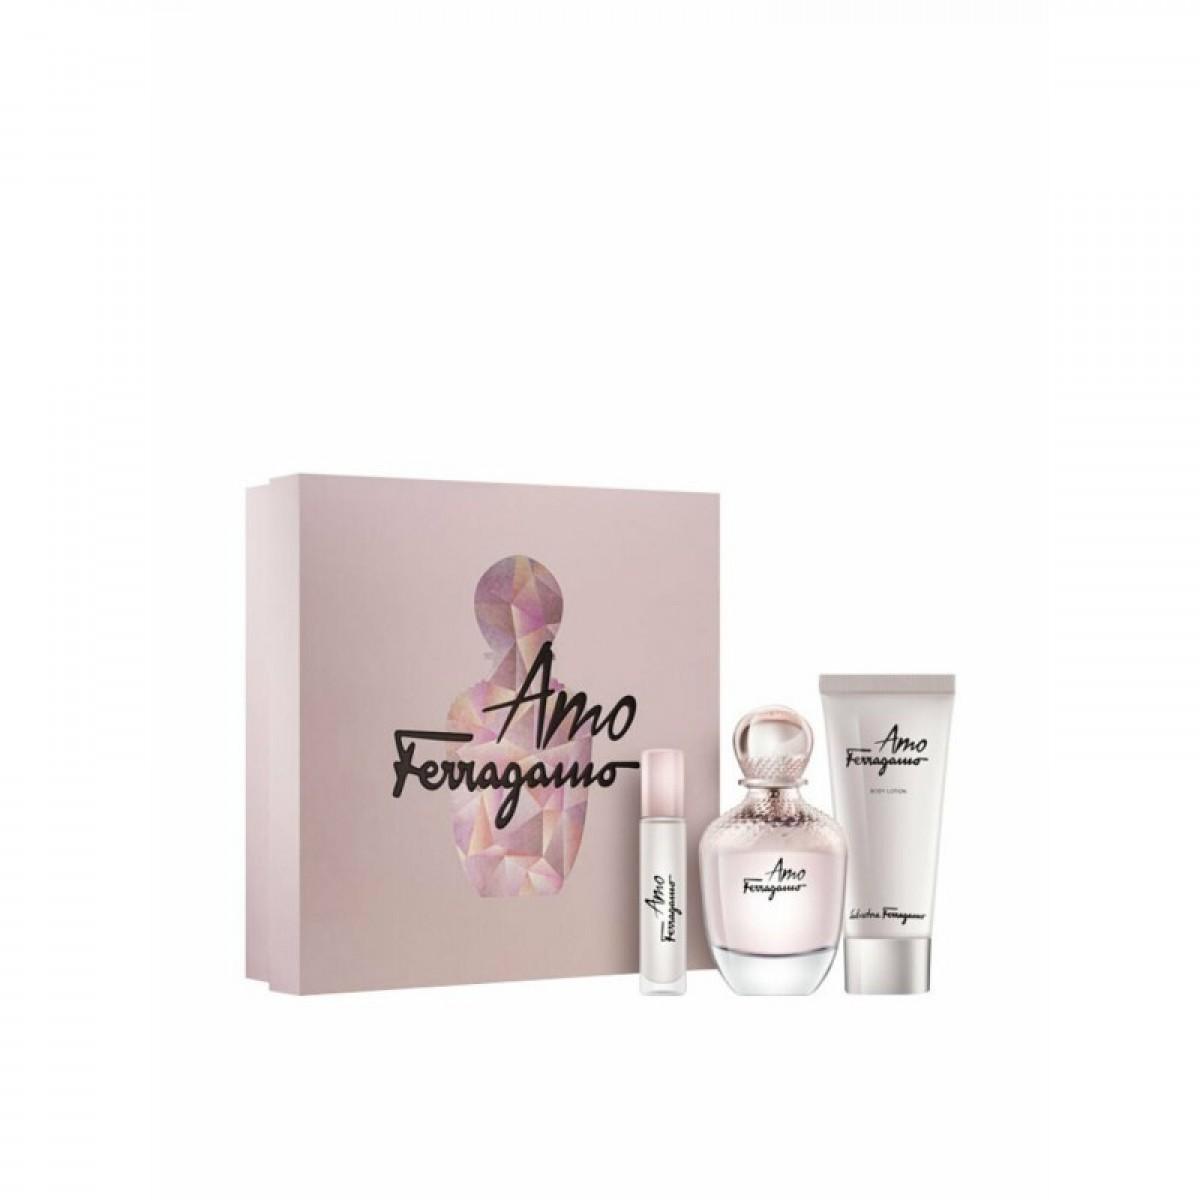 Amo Holiday Limited Edition Set